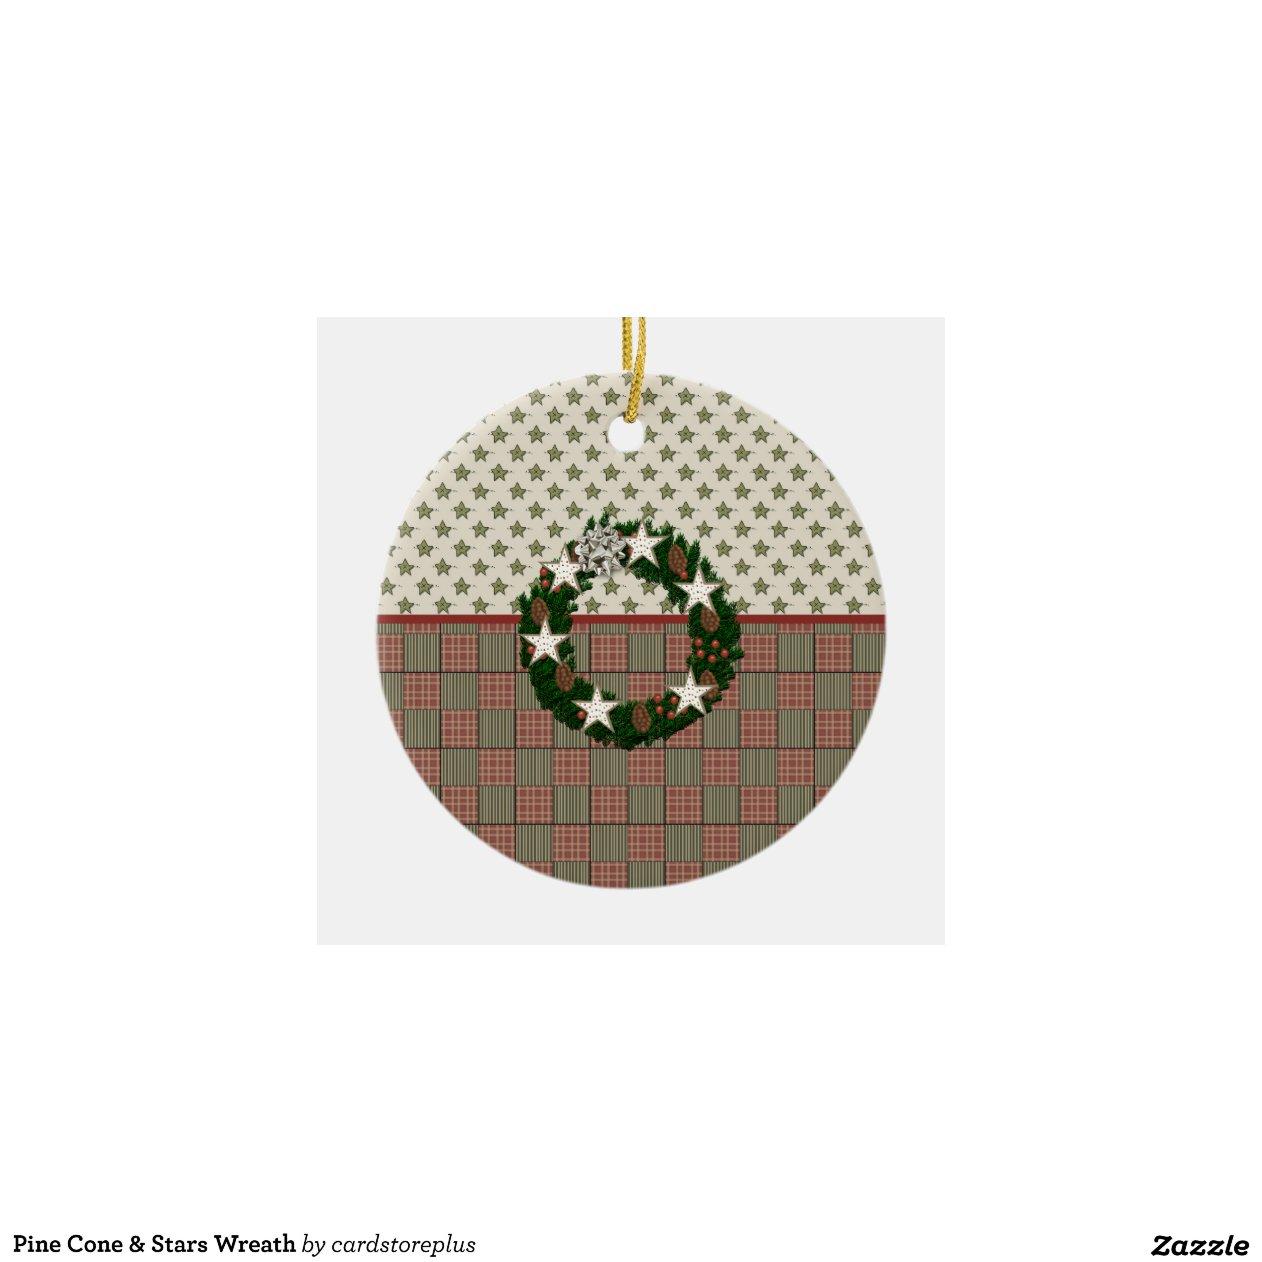 Pine cone stars wreath christmas tree ornaments zazzle for Pine cone christmas tree ornaments